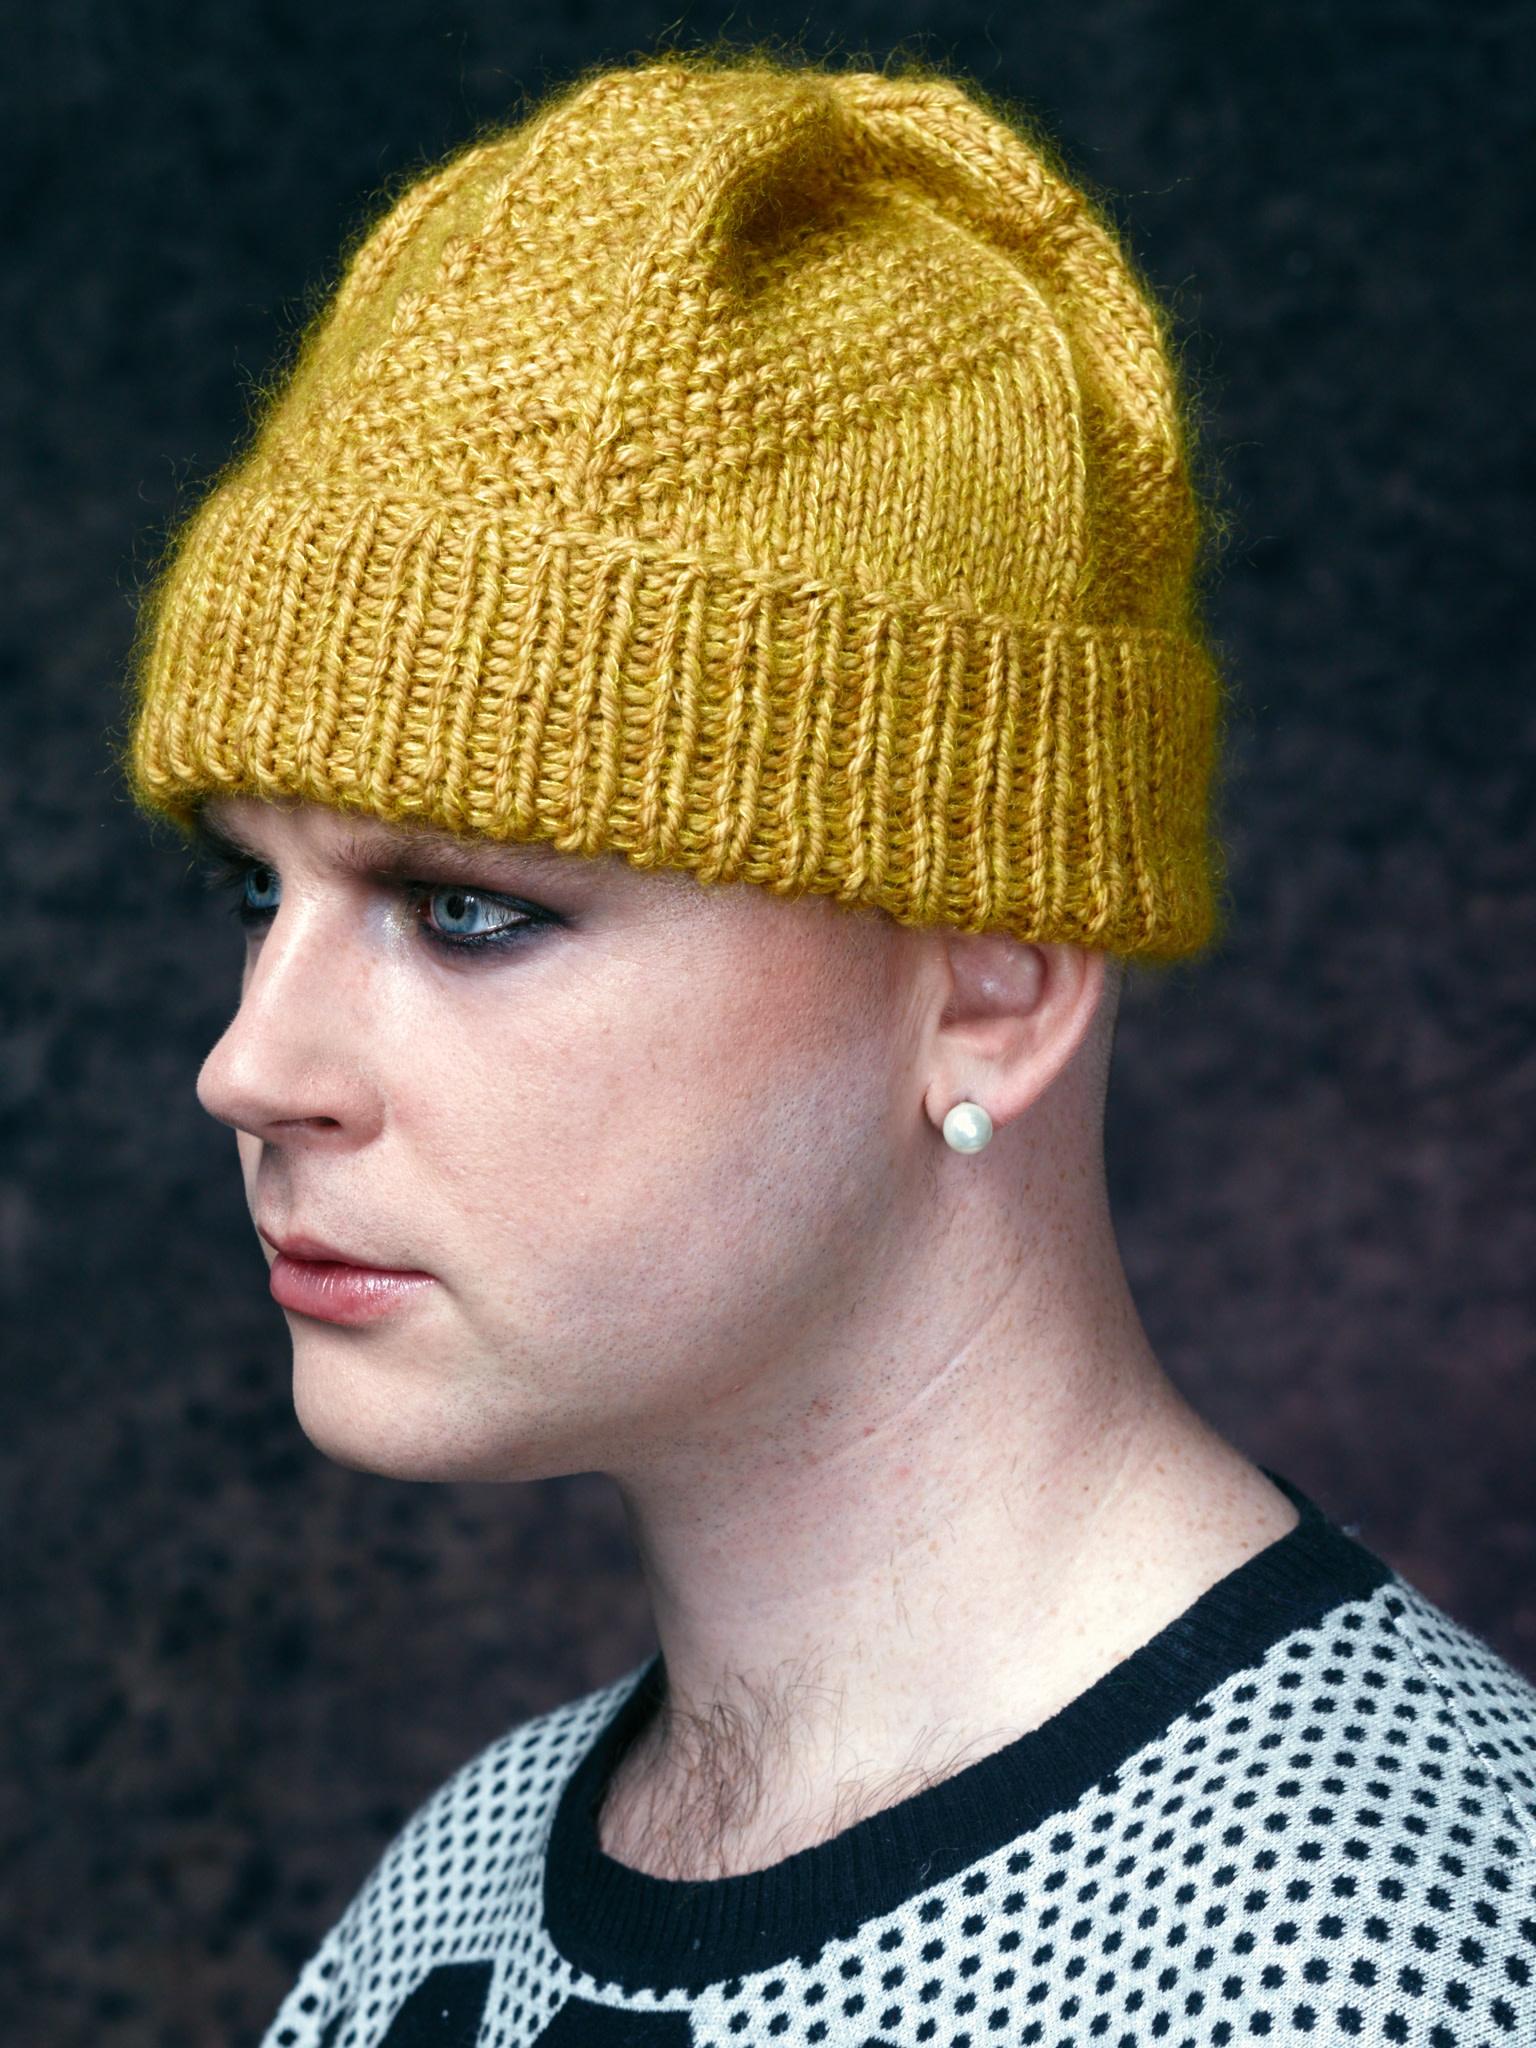 Westknits WK HIBERKNITTING HAT - KIT GREEN OLIVE